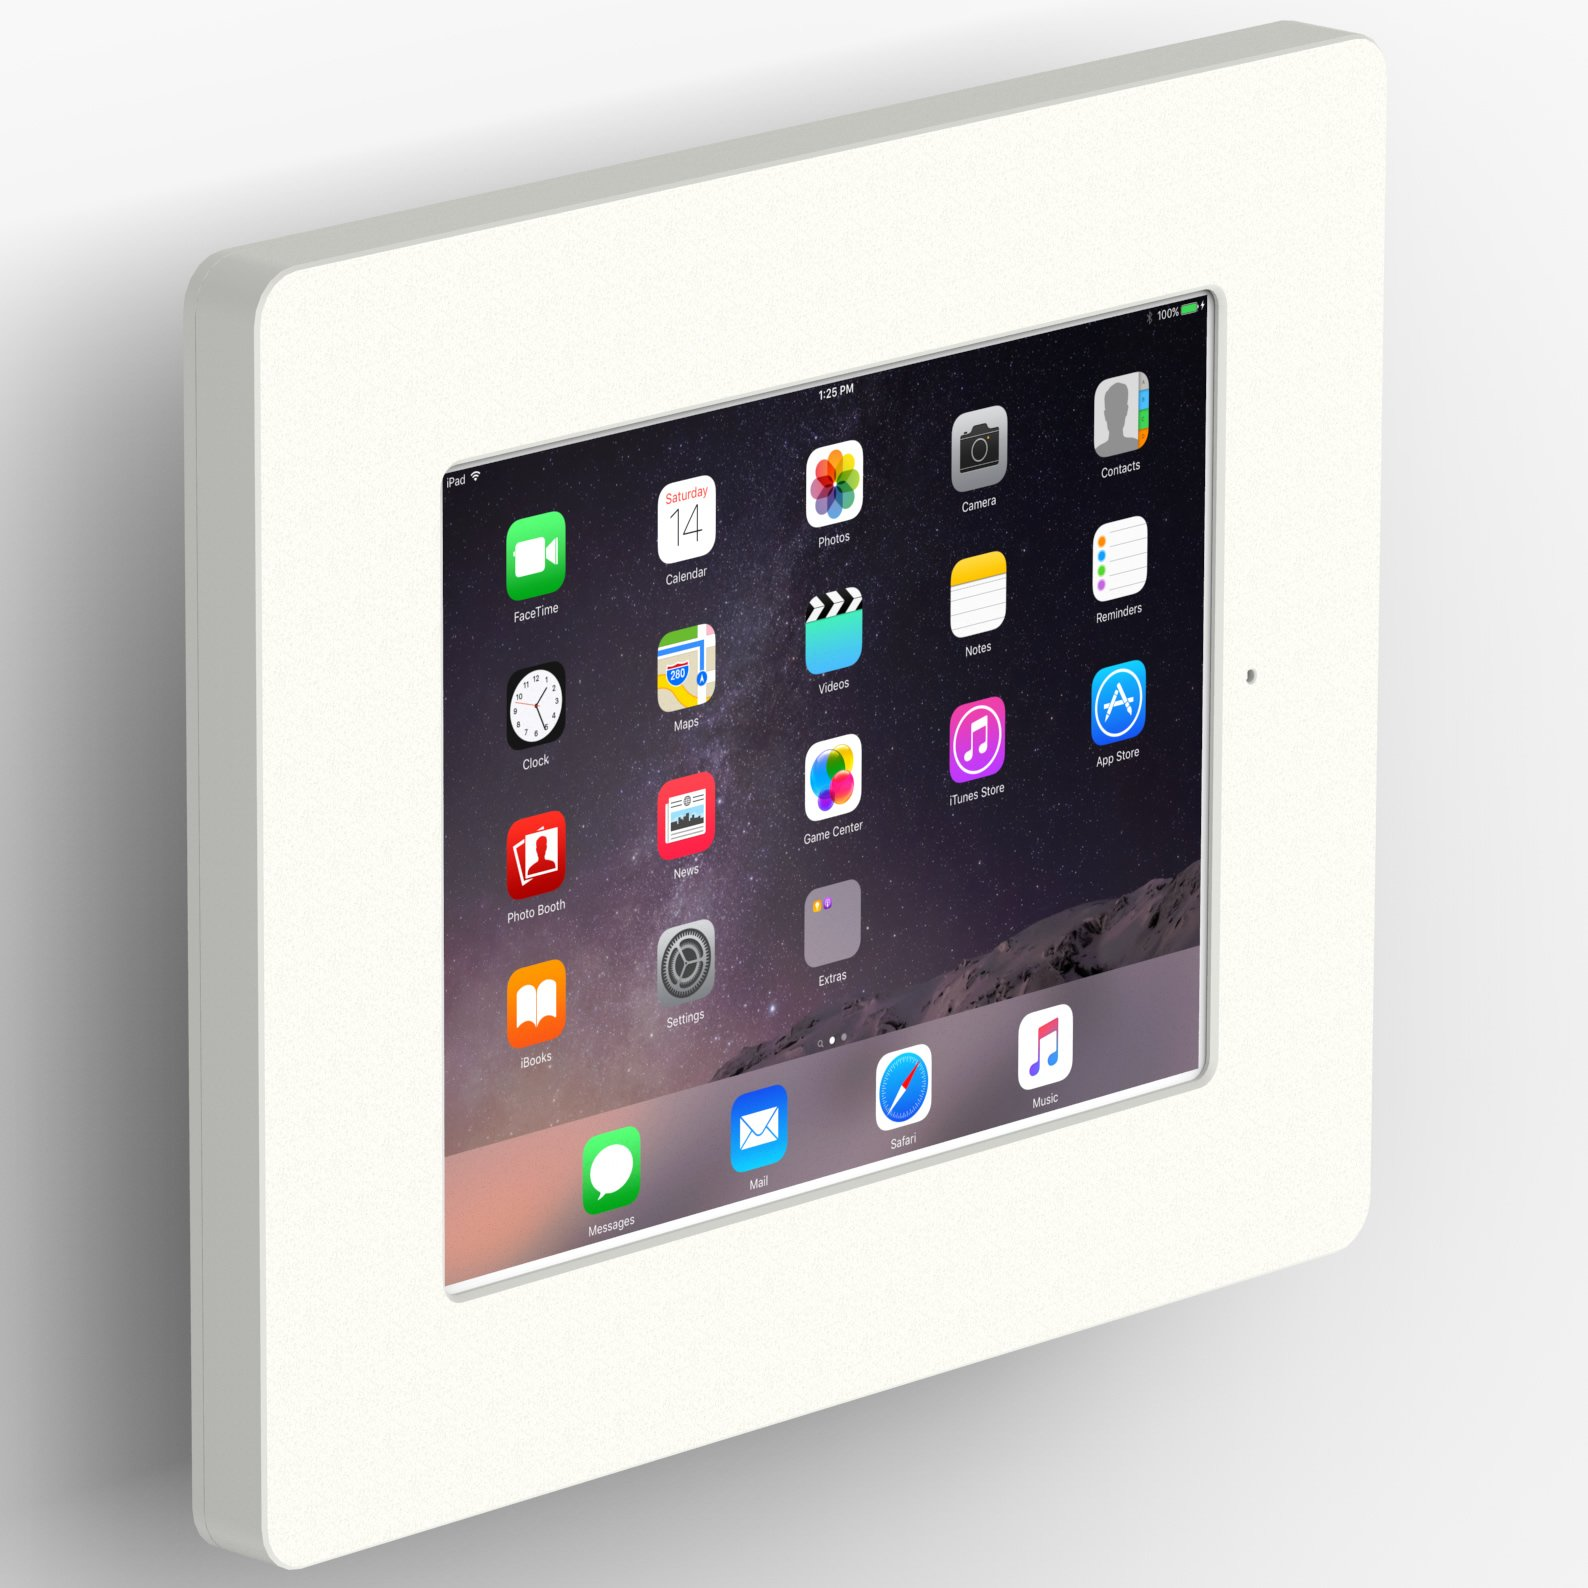 iPad 2/3/4 VESA LGrey Home Button Covered Tablet Enclosure w Tilting VESA Mount [Bundle] by VidaBox Kiosks